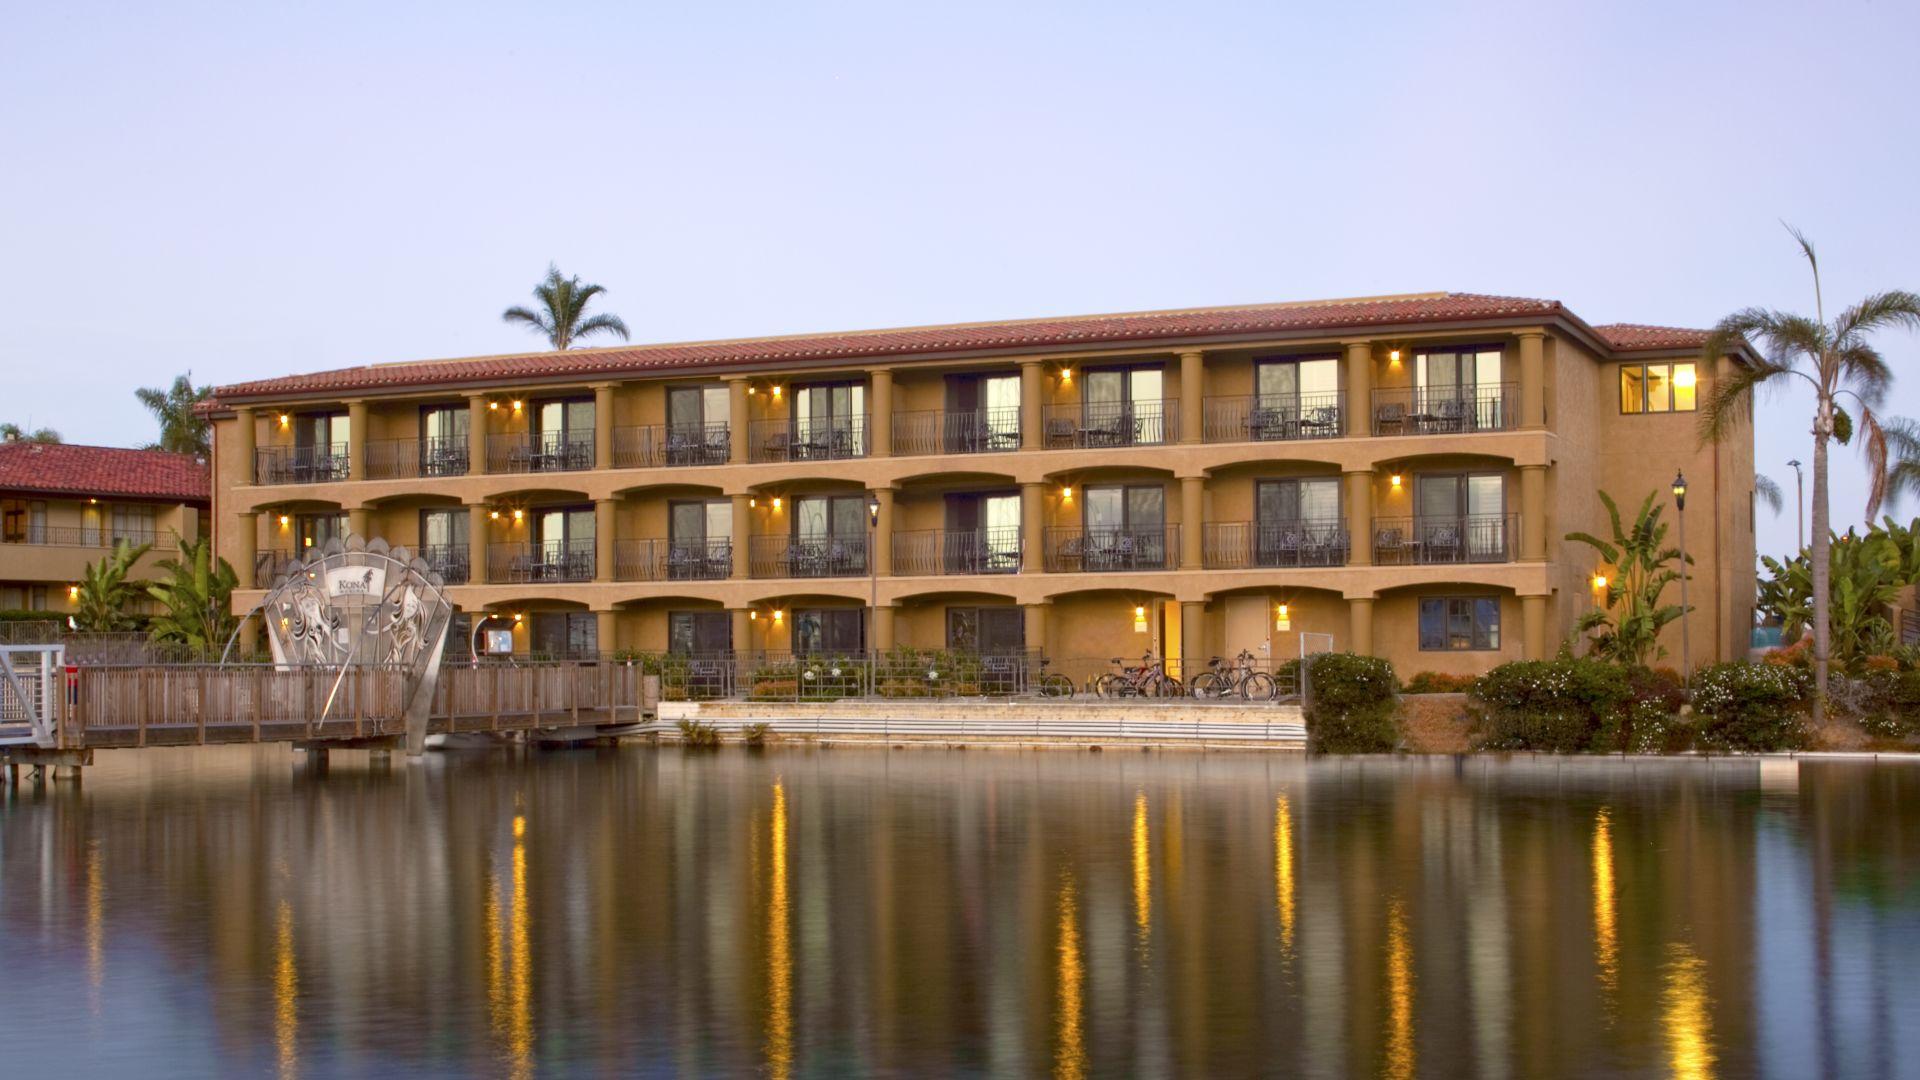 Shelter Island Hotel | Best Western PLUS Island Palms Hotel